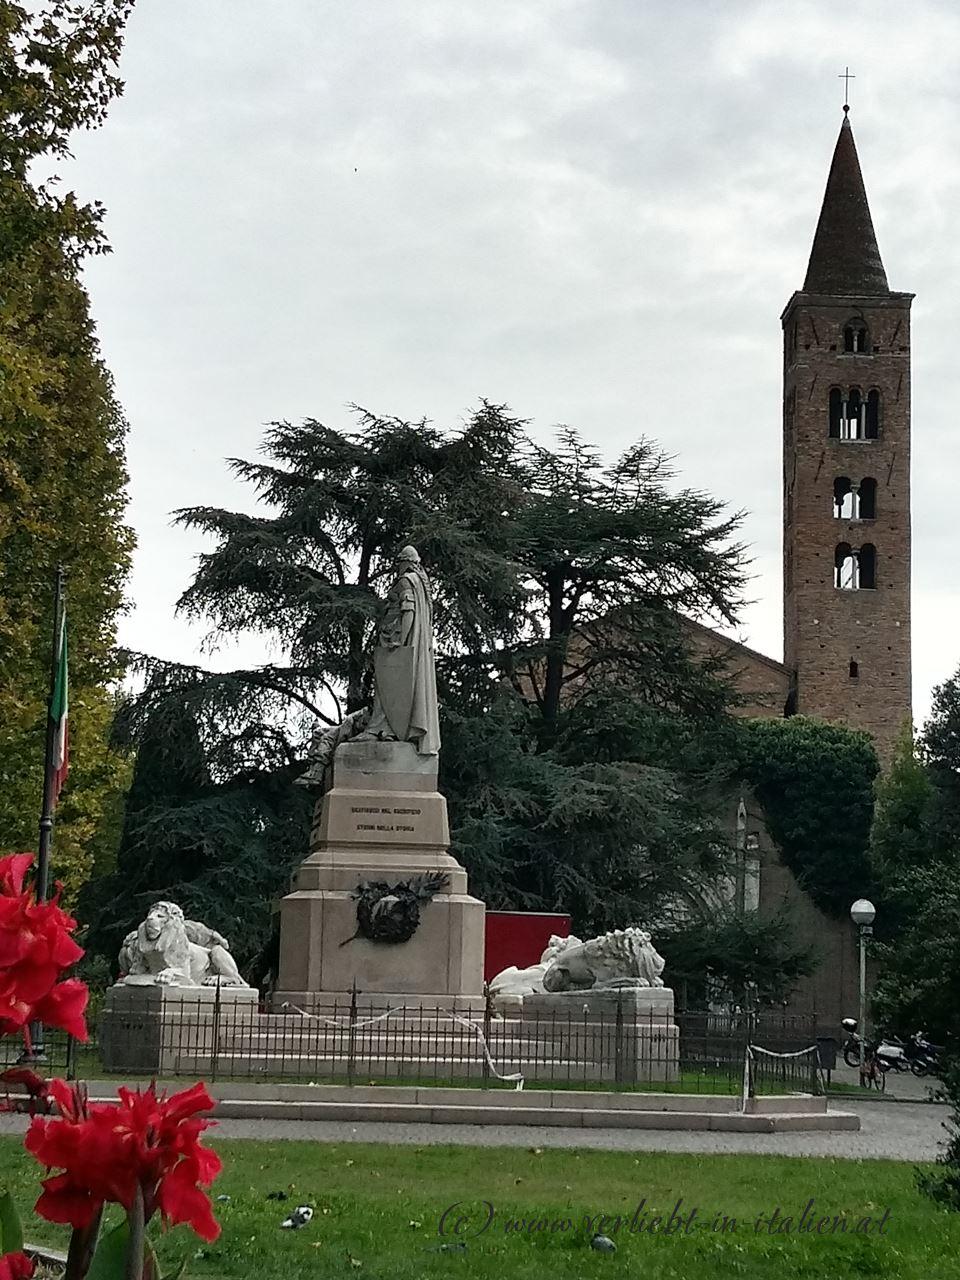 Piazza A. Garibaldi